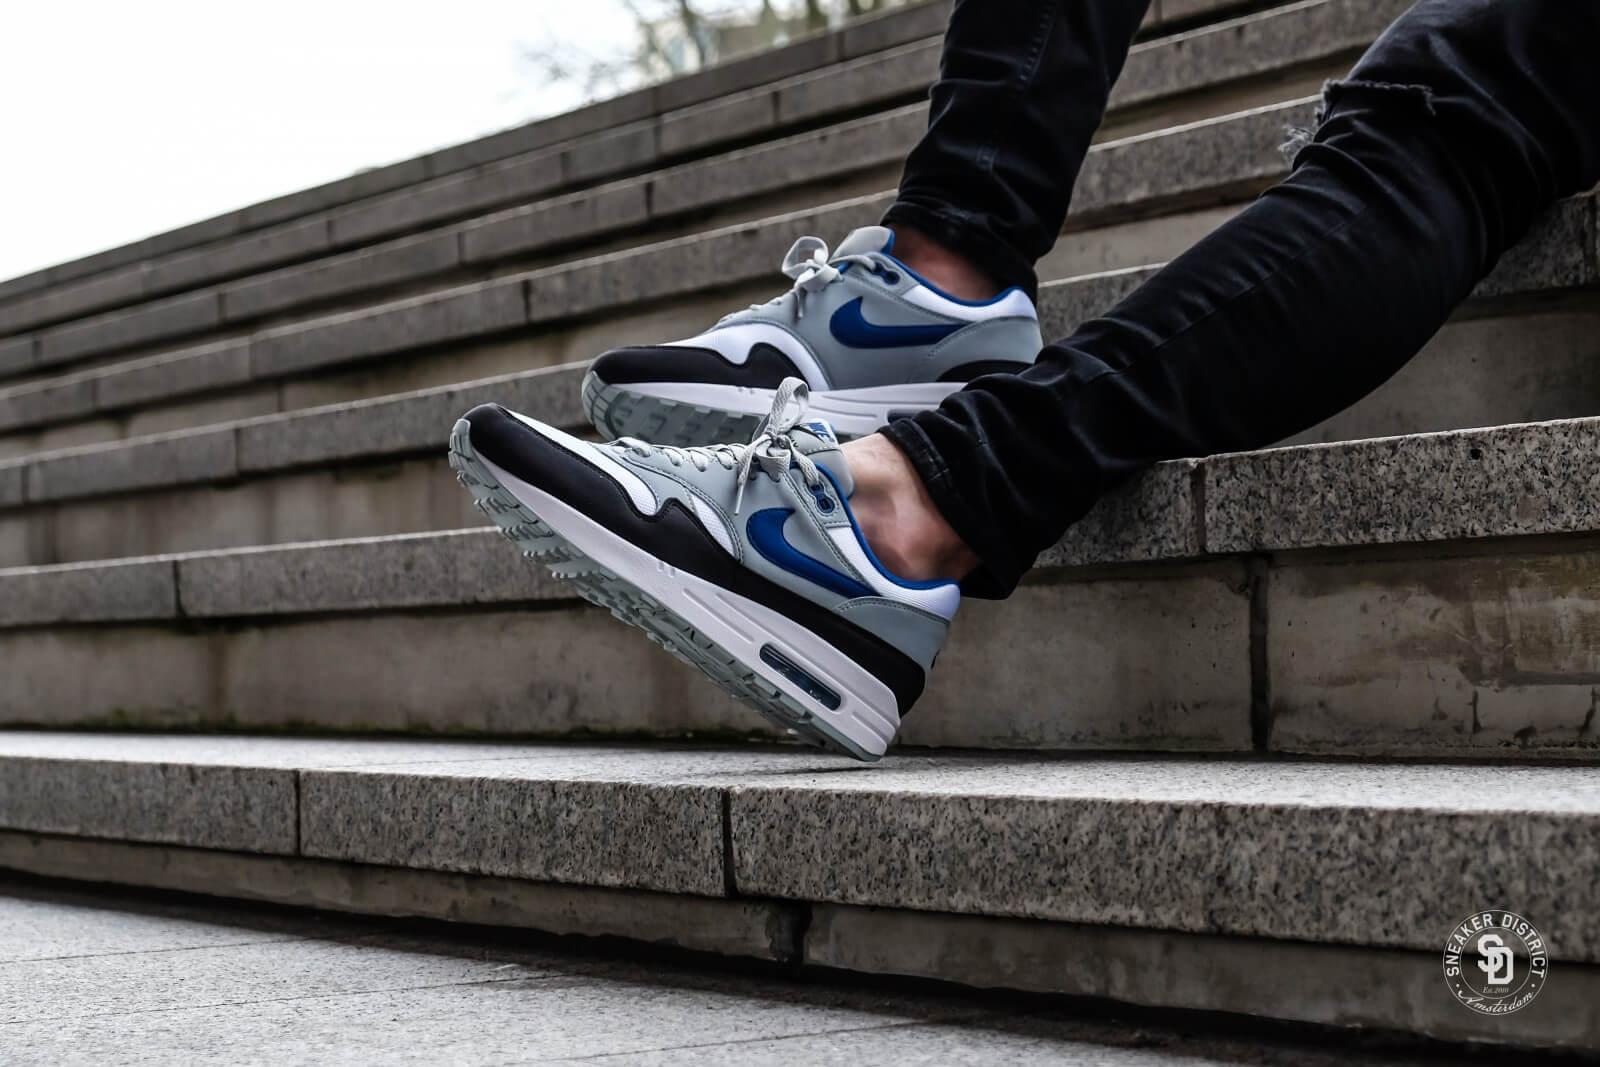 Nike Air Max Thea Light Bone leoncamier.co.uk